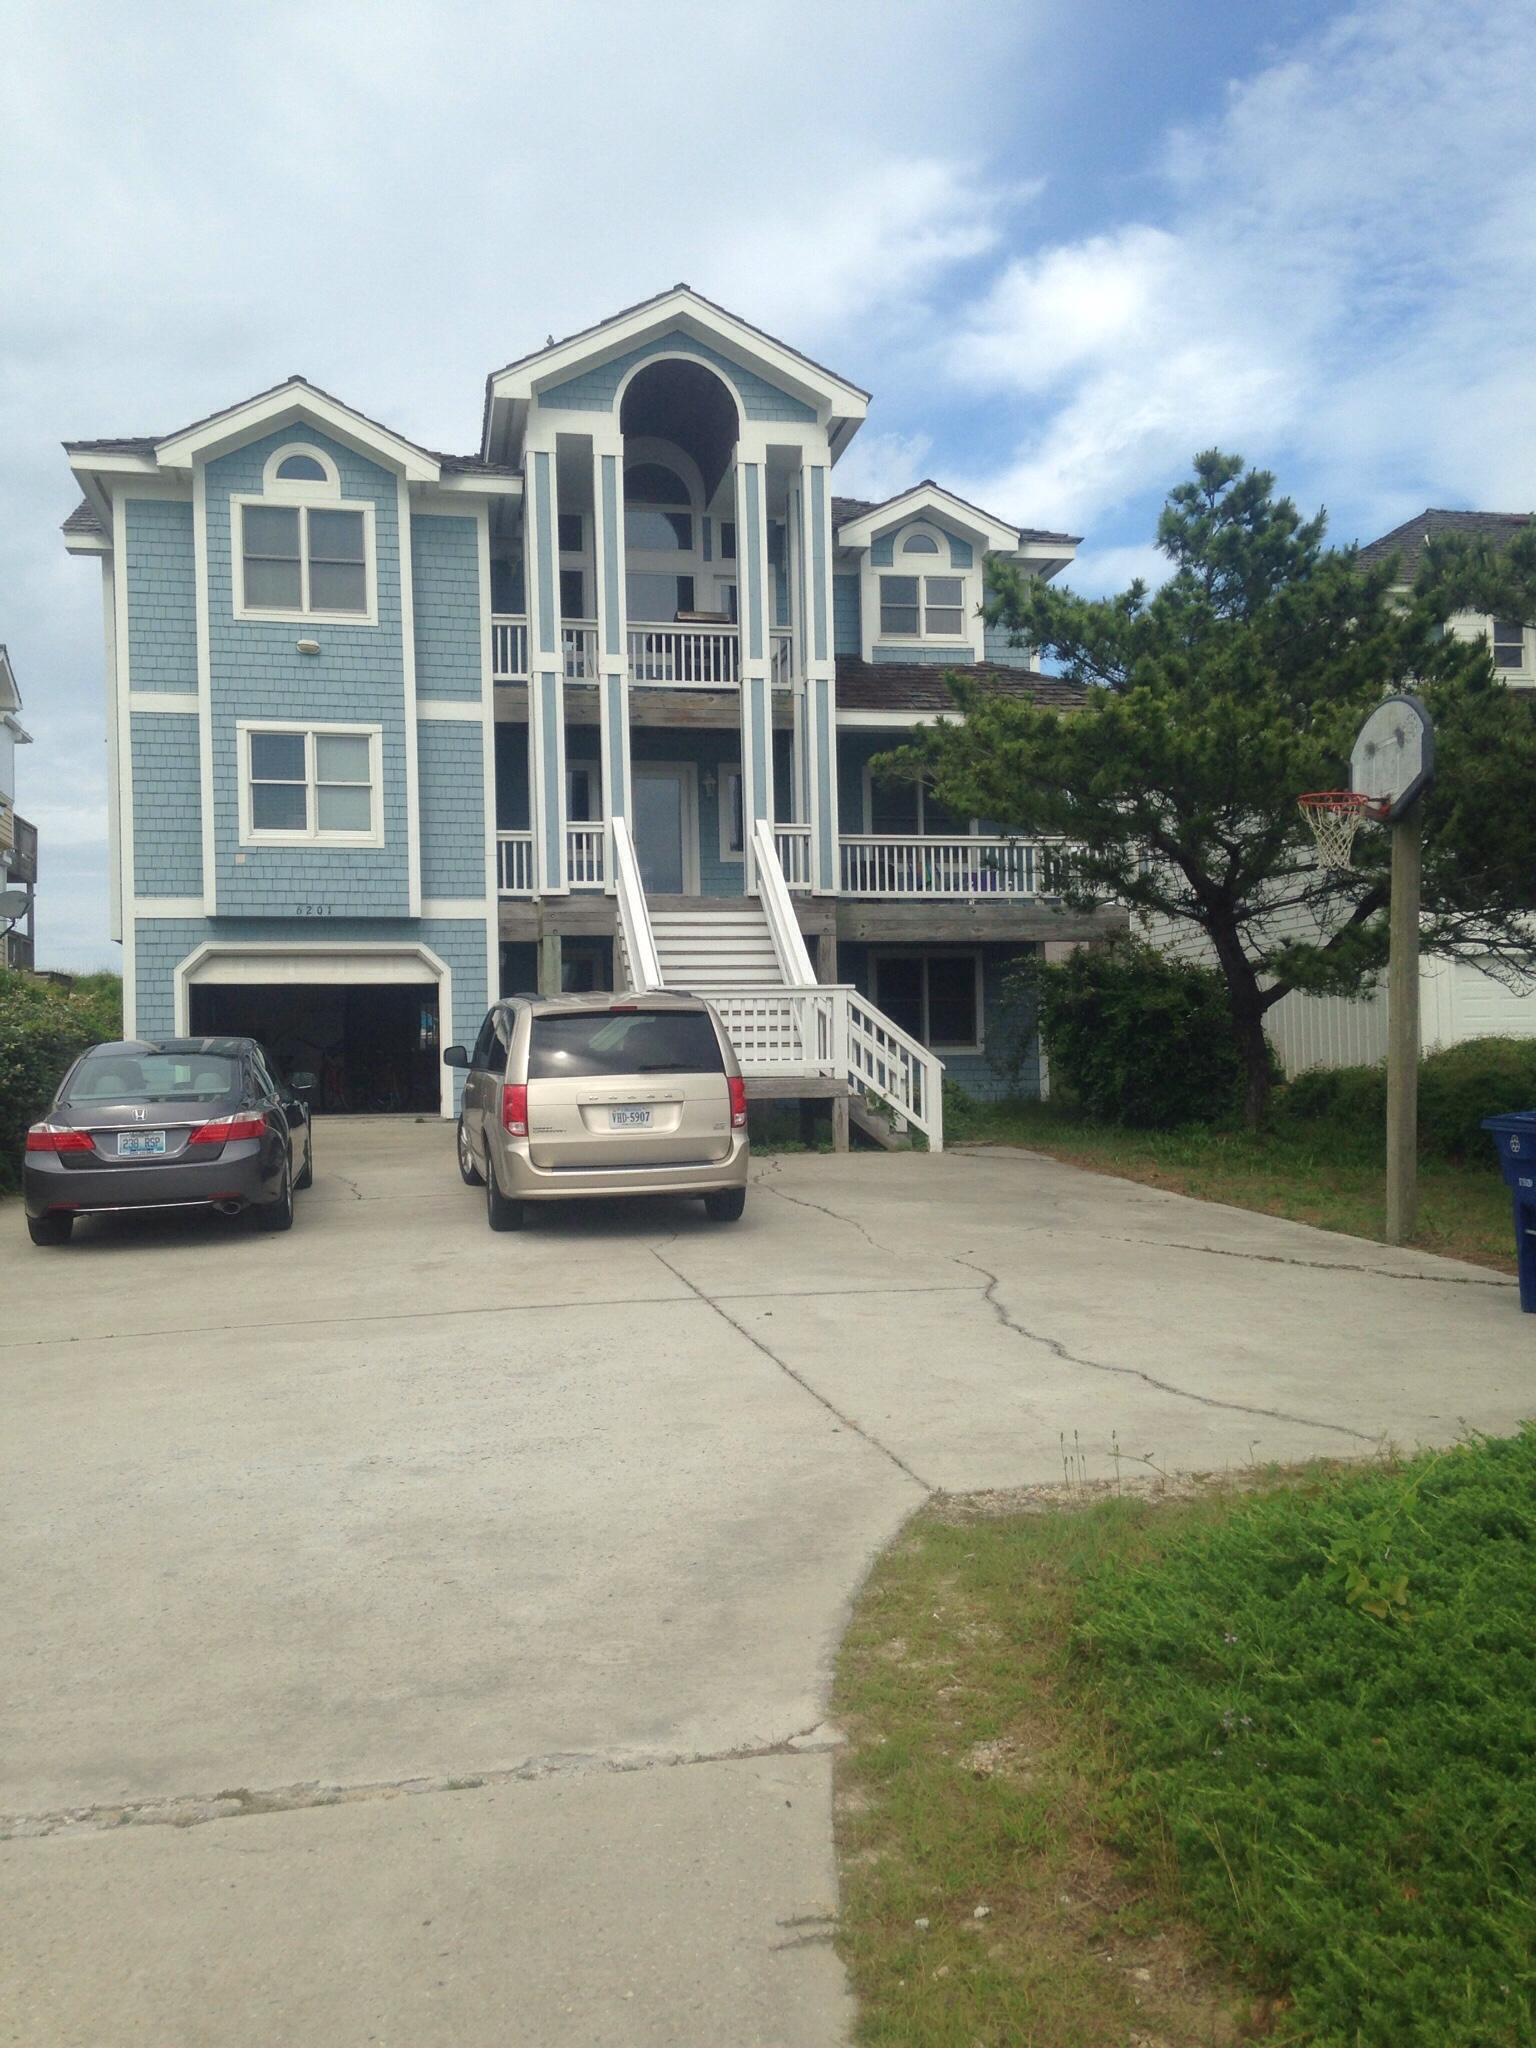 May 2016 Stay - BH1S - Beach Haven 1 South, Carolyn Gallatin